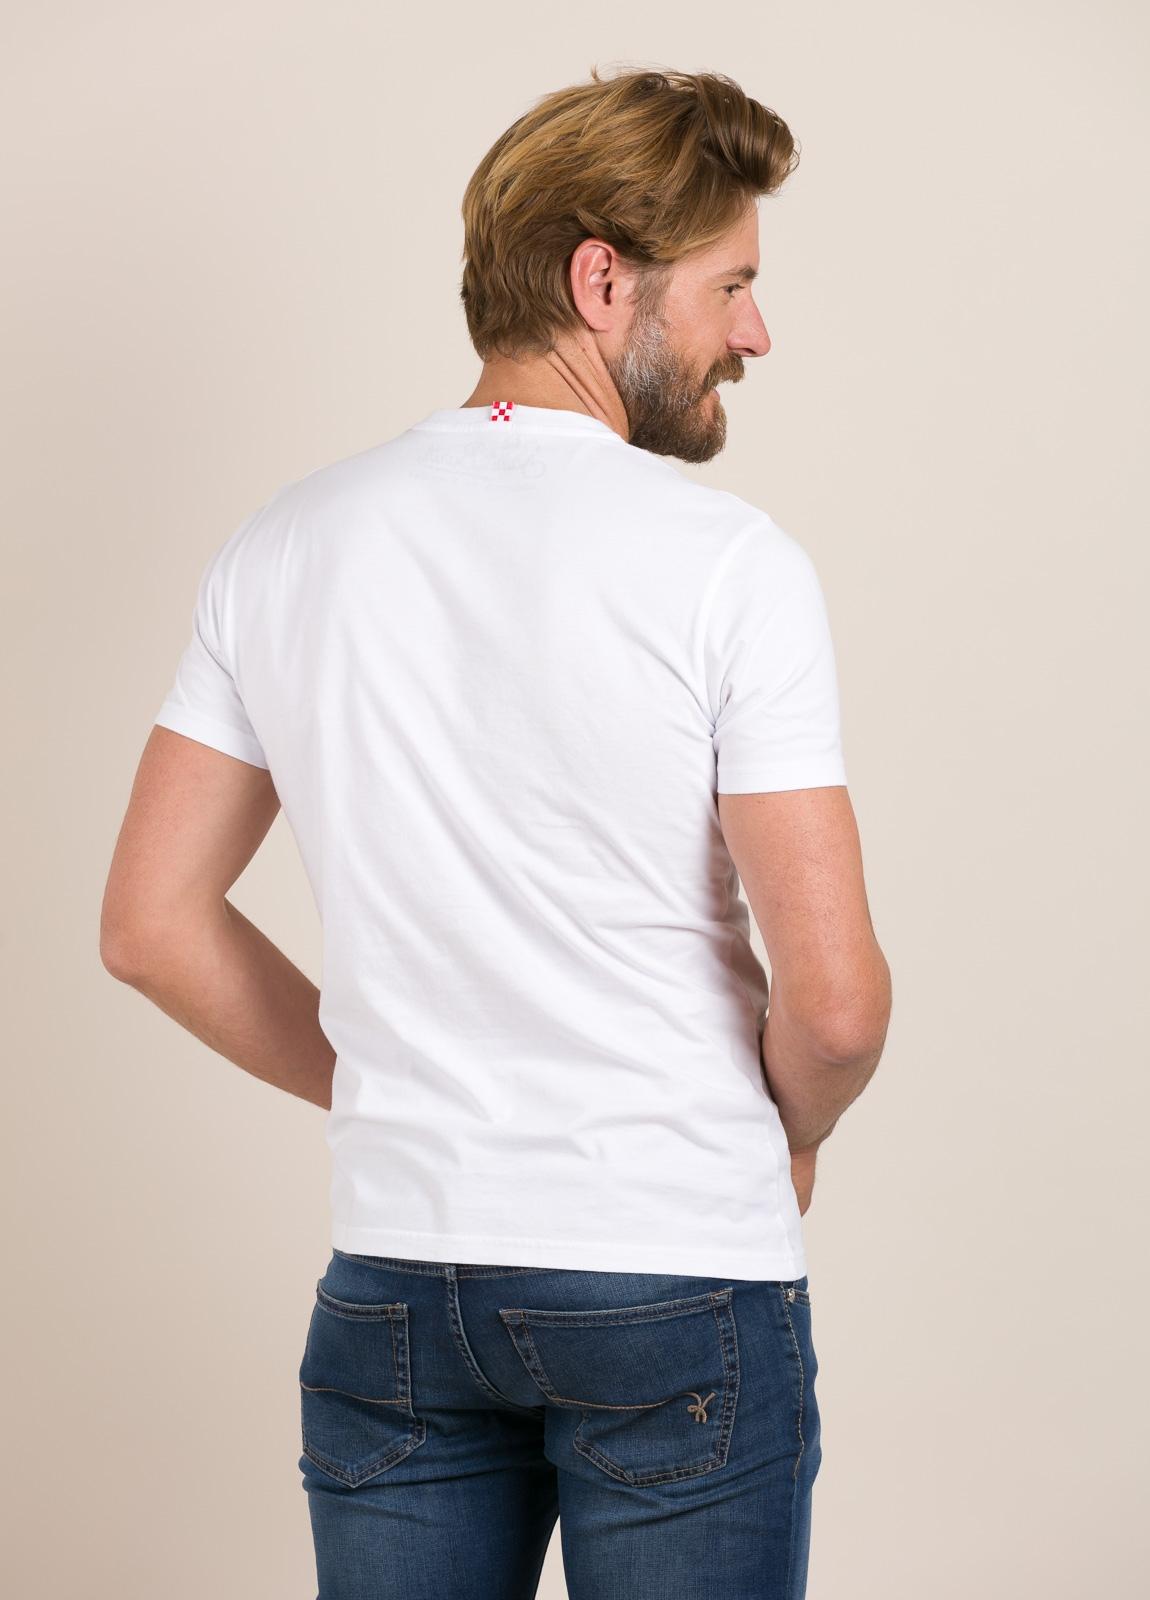 Camiseta MC2 estampado gráfico mono - Ítem1